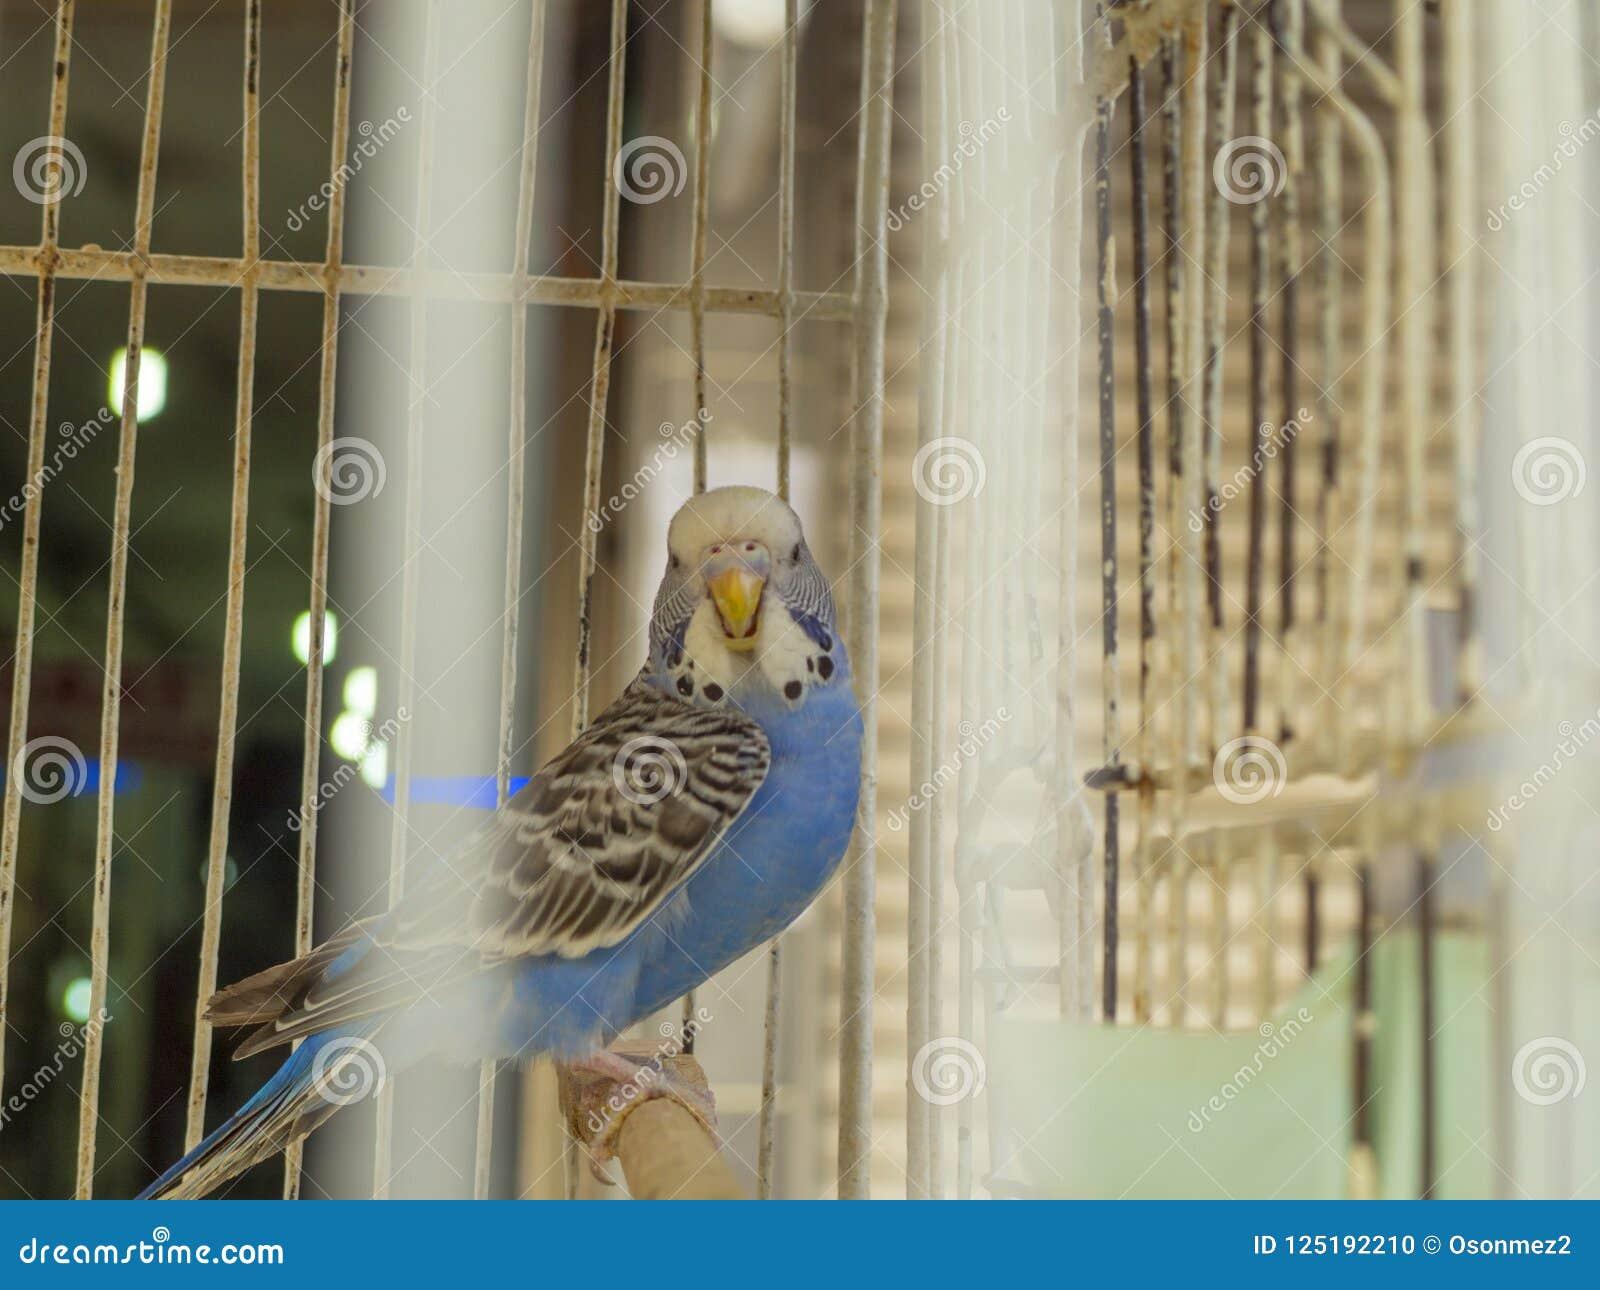 El pájaro azul del budgie en una jaula que aparezca a través de jaula ata